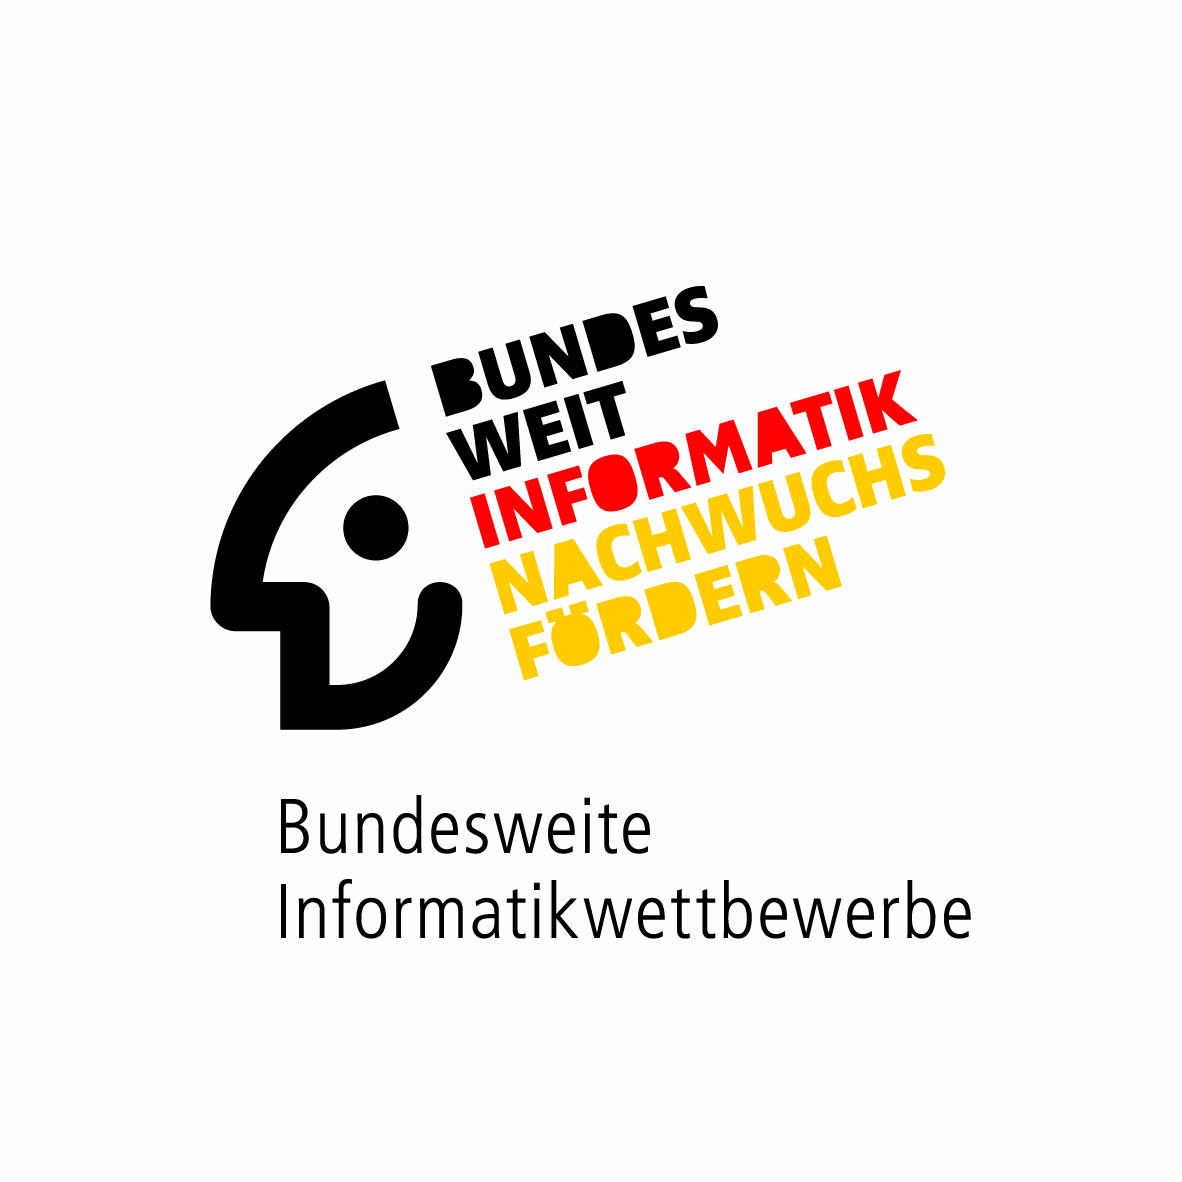 Bundesweite Informatikwettbewerbe